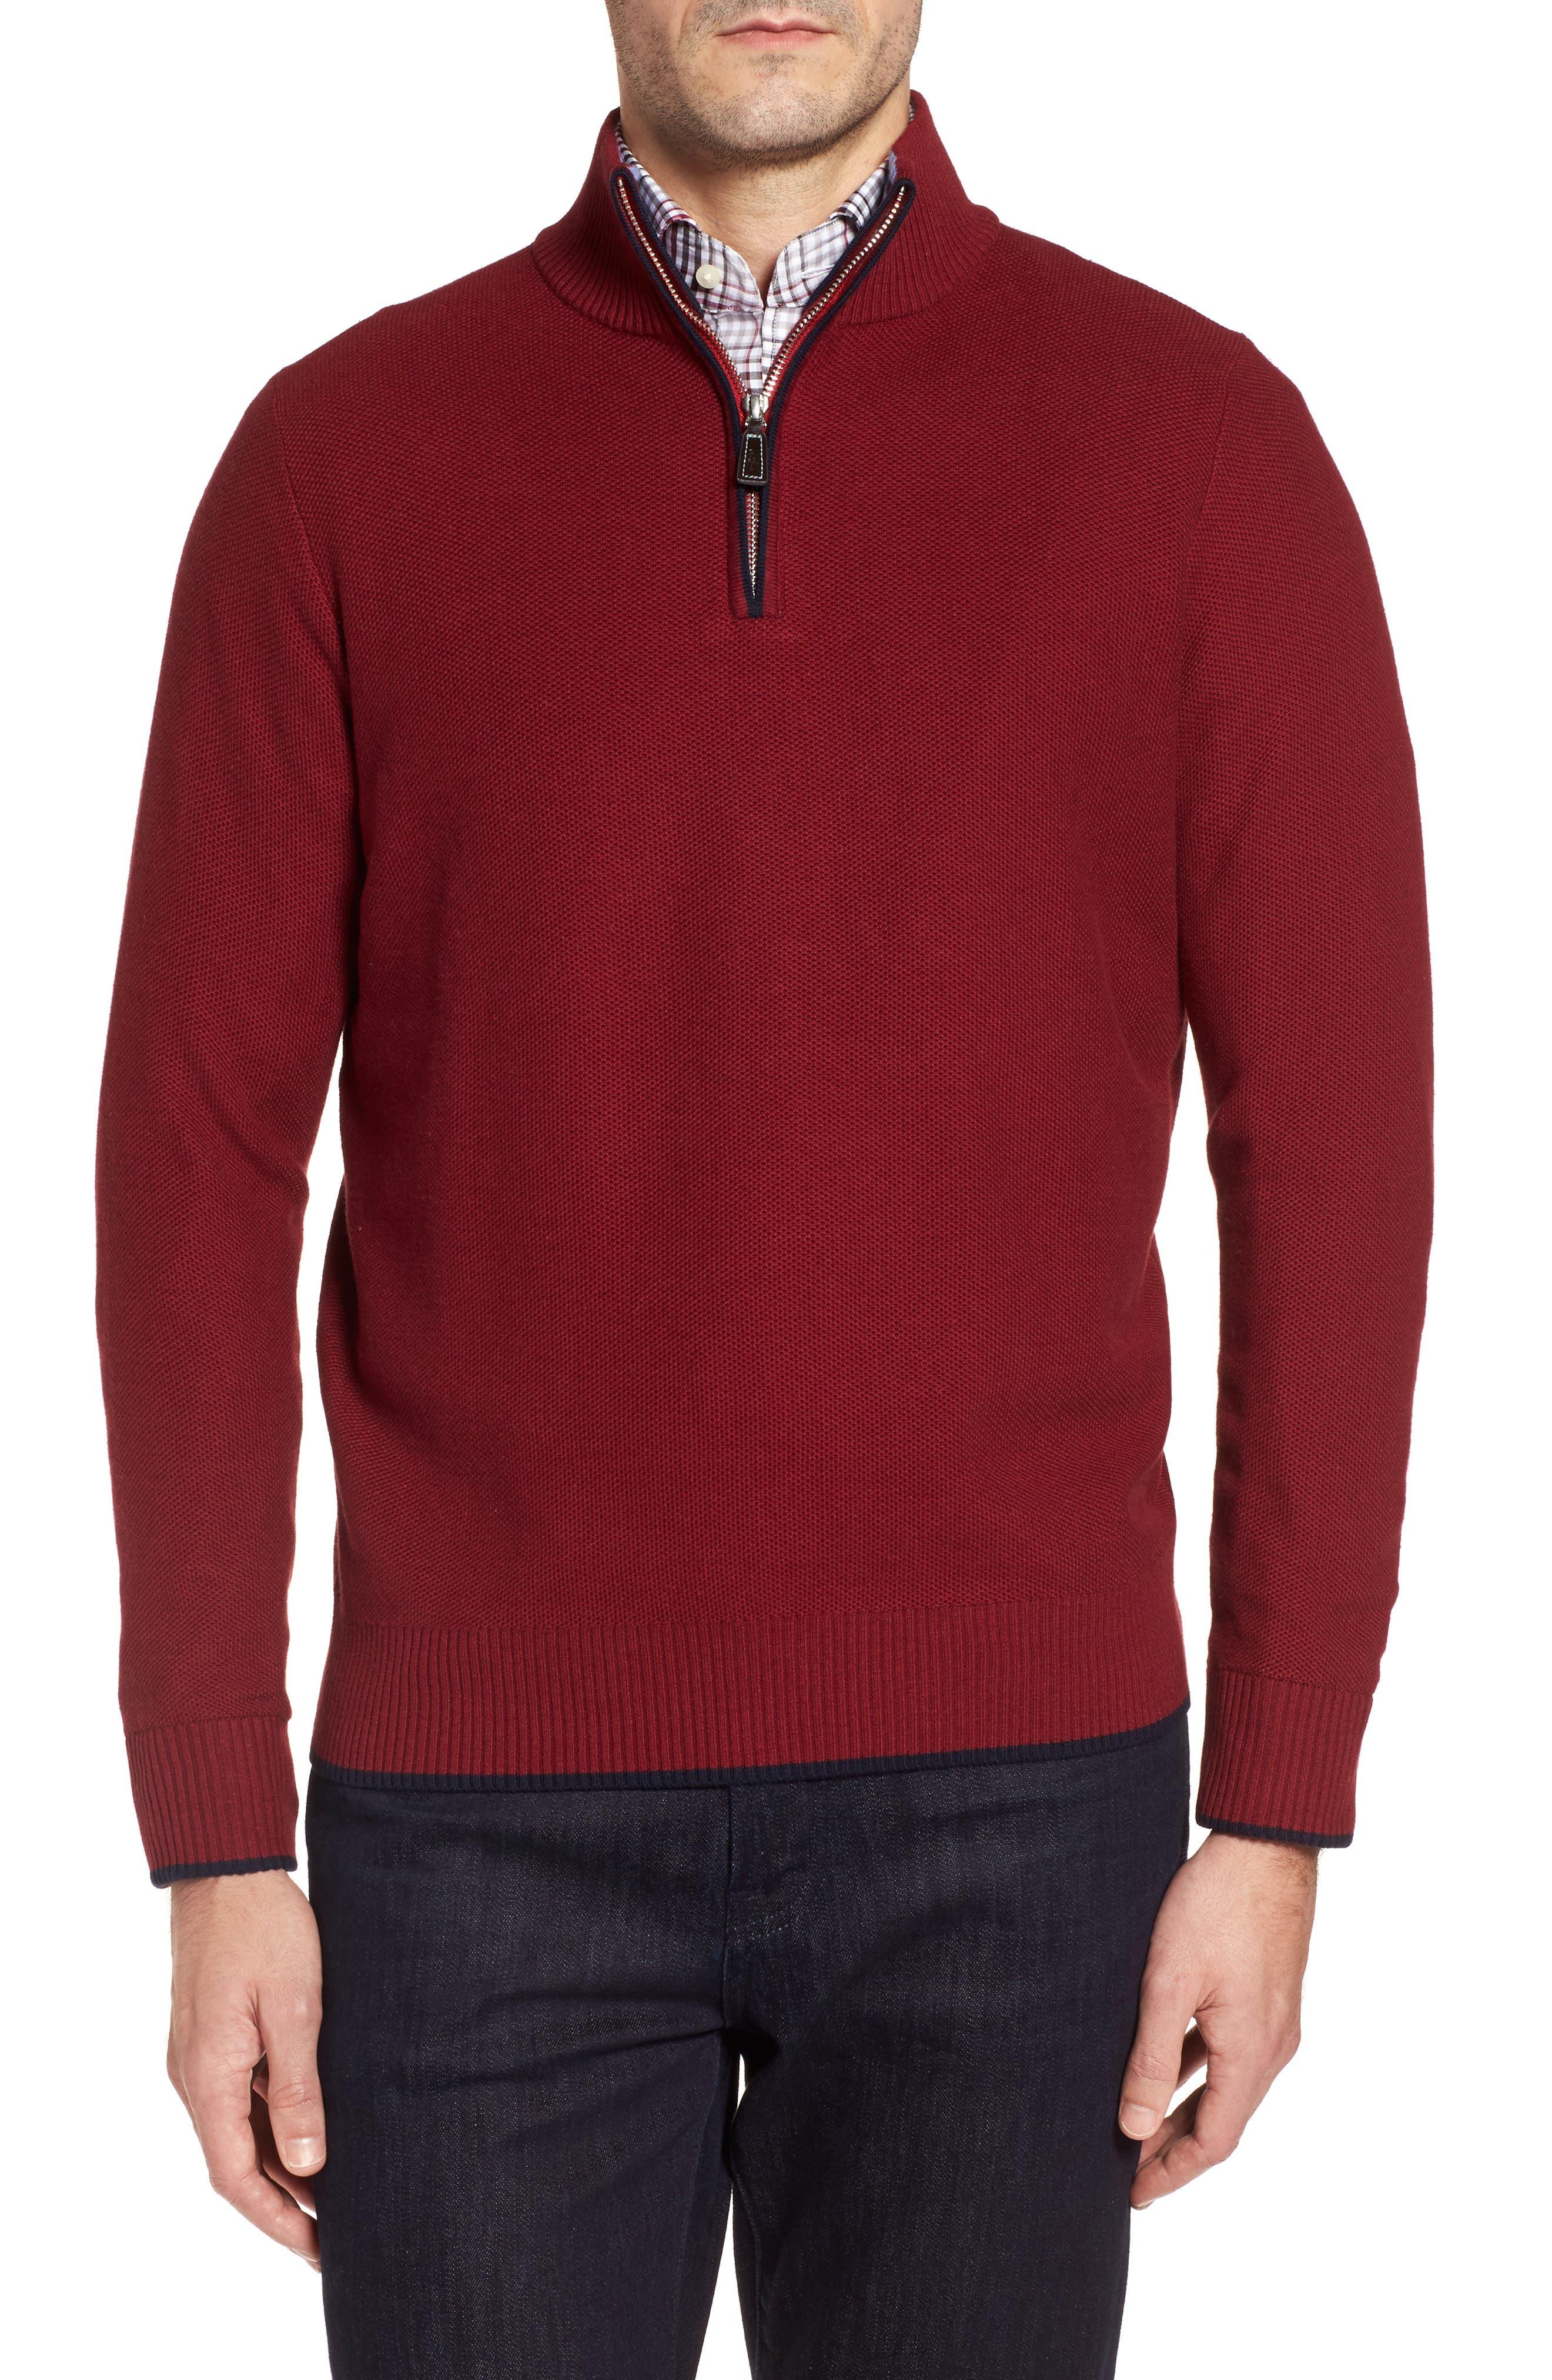 Prien Tipped Quarter Zip Sweater,                             Main thumbnail 1, color,                             600